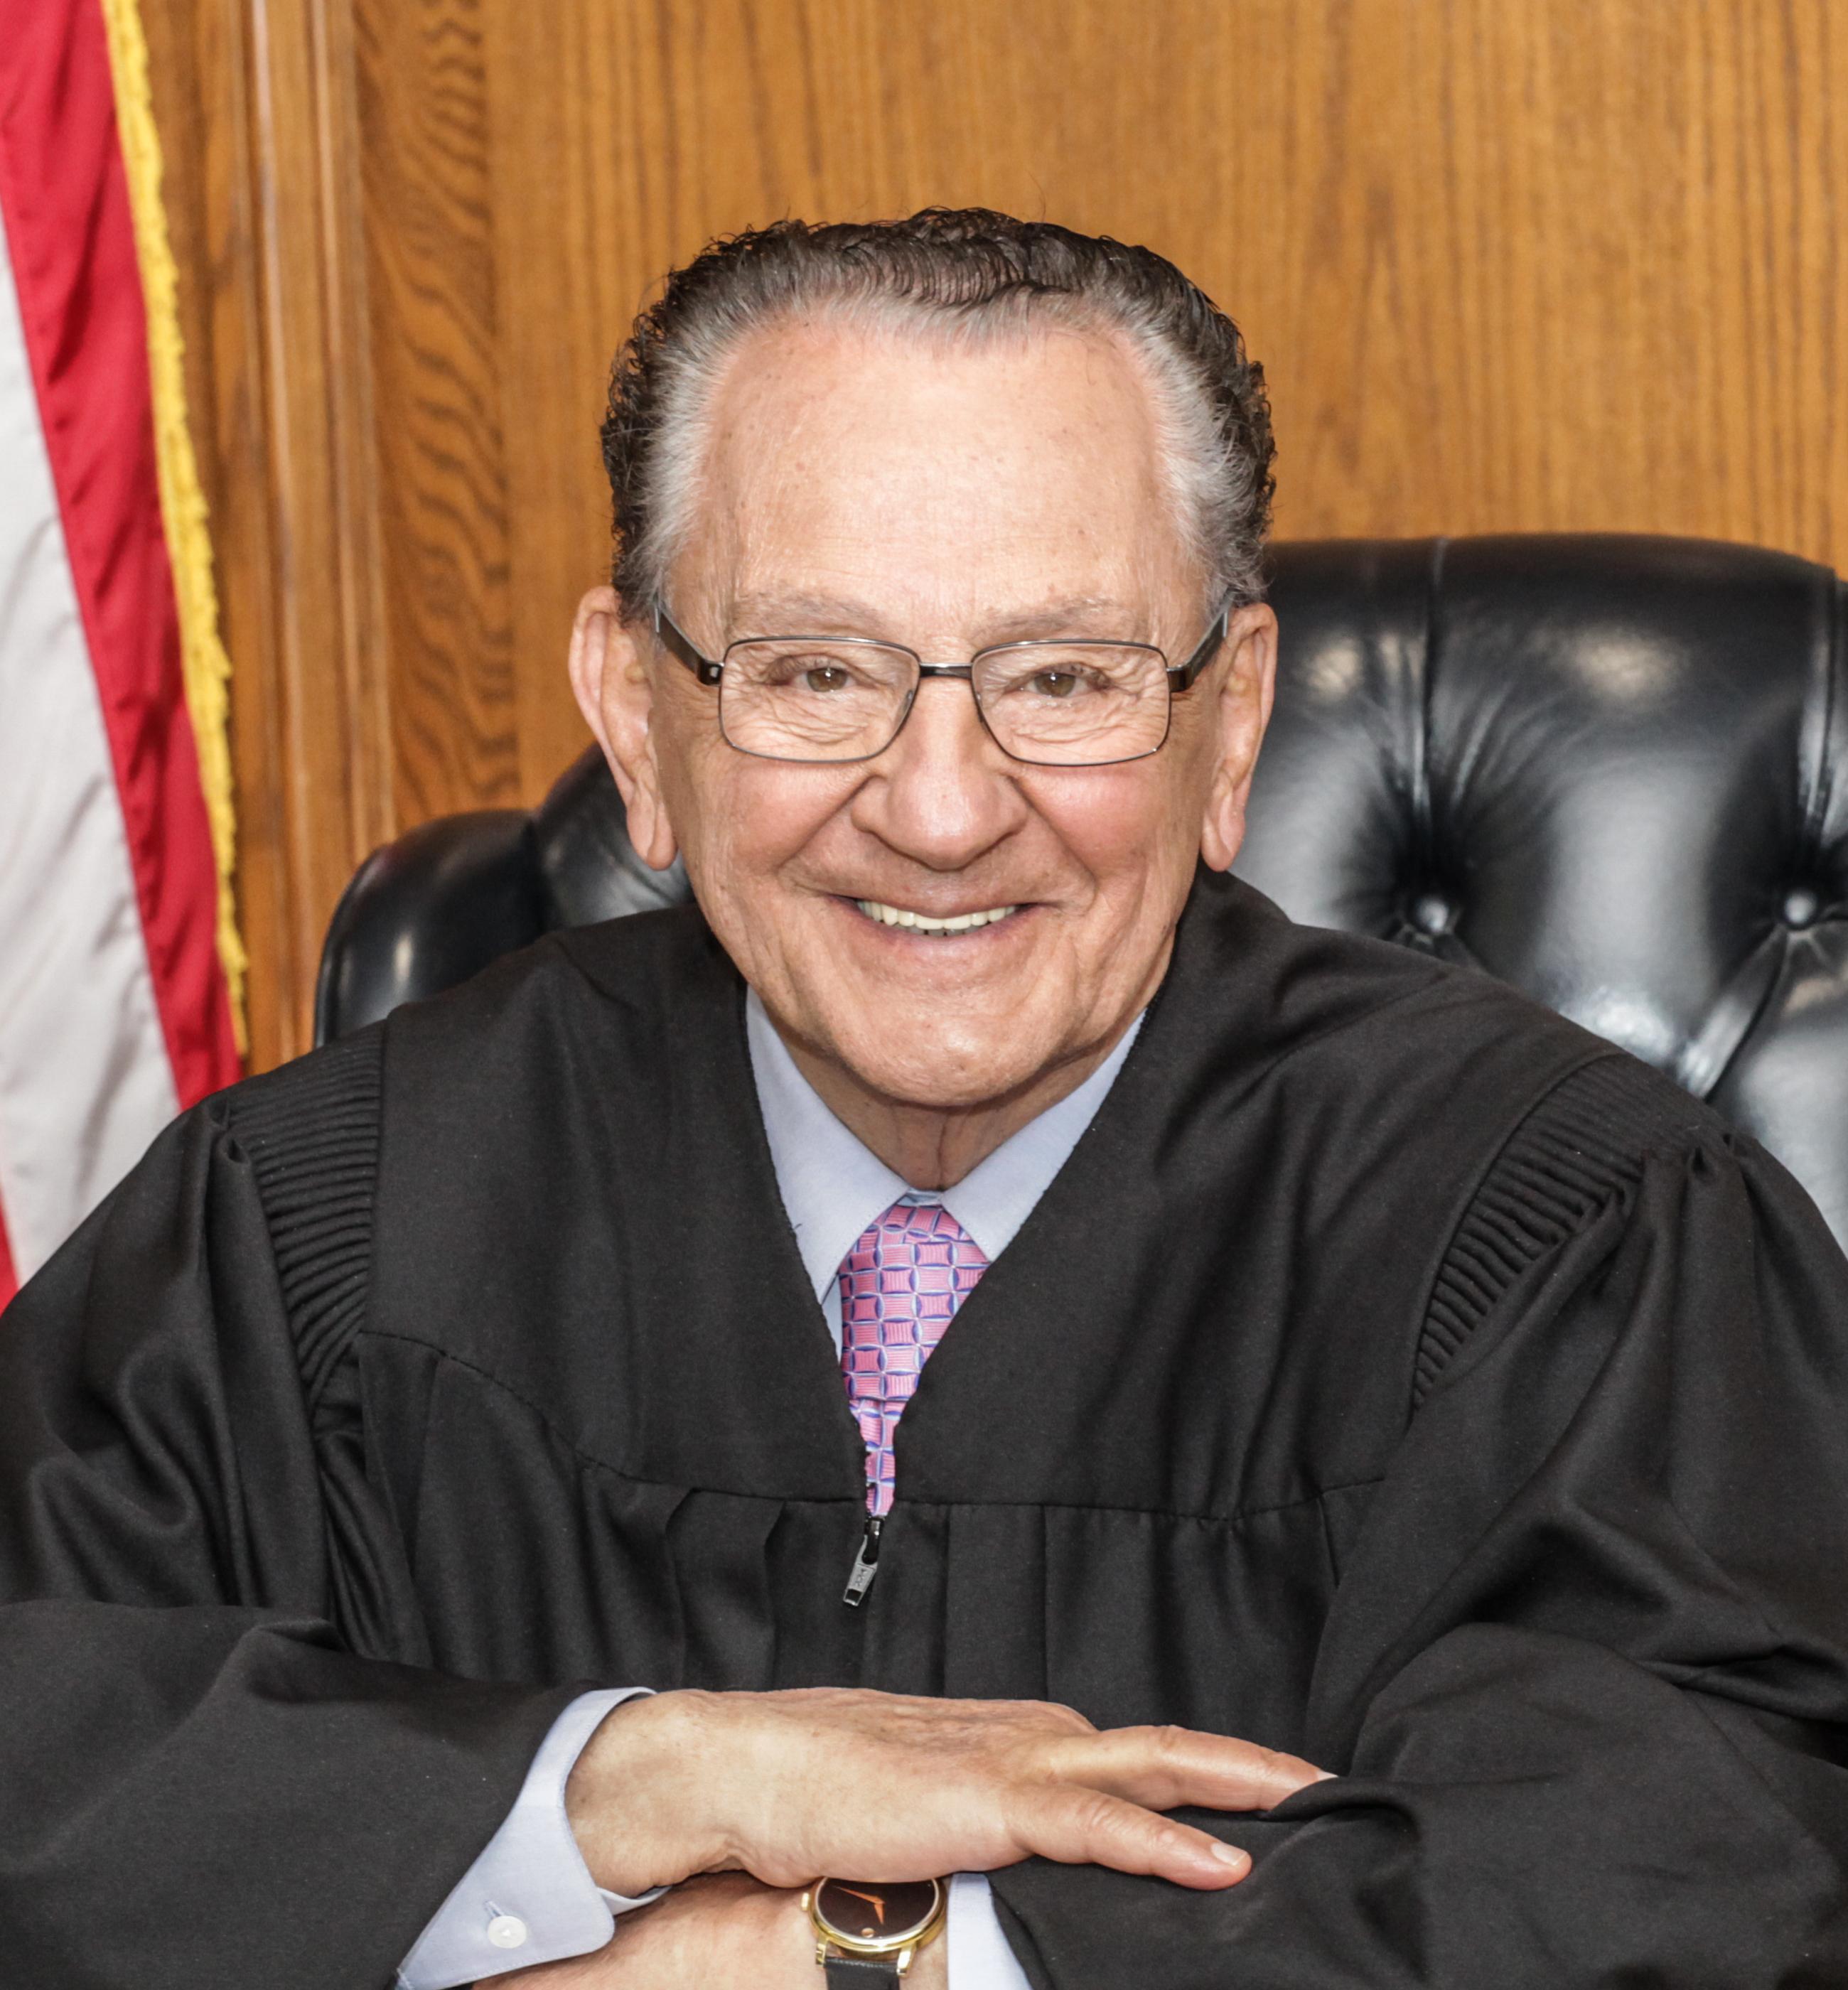 Frank Judge